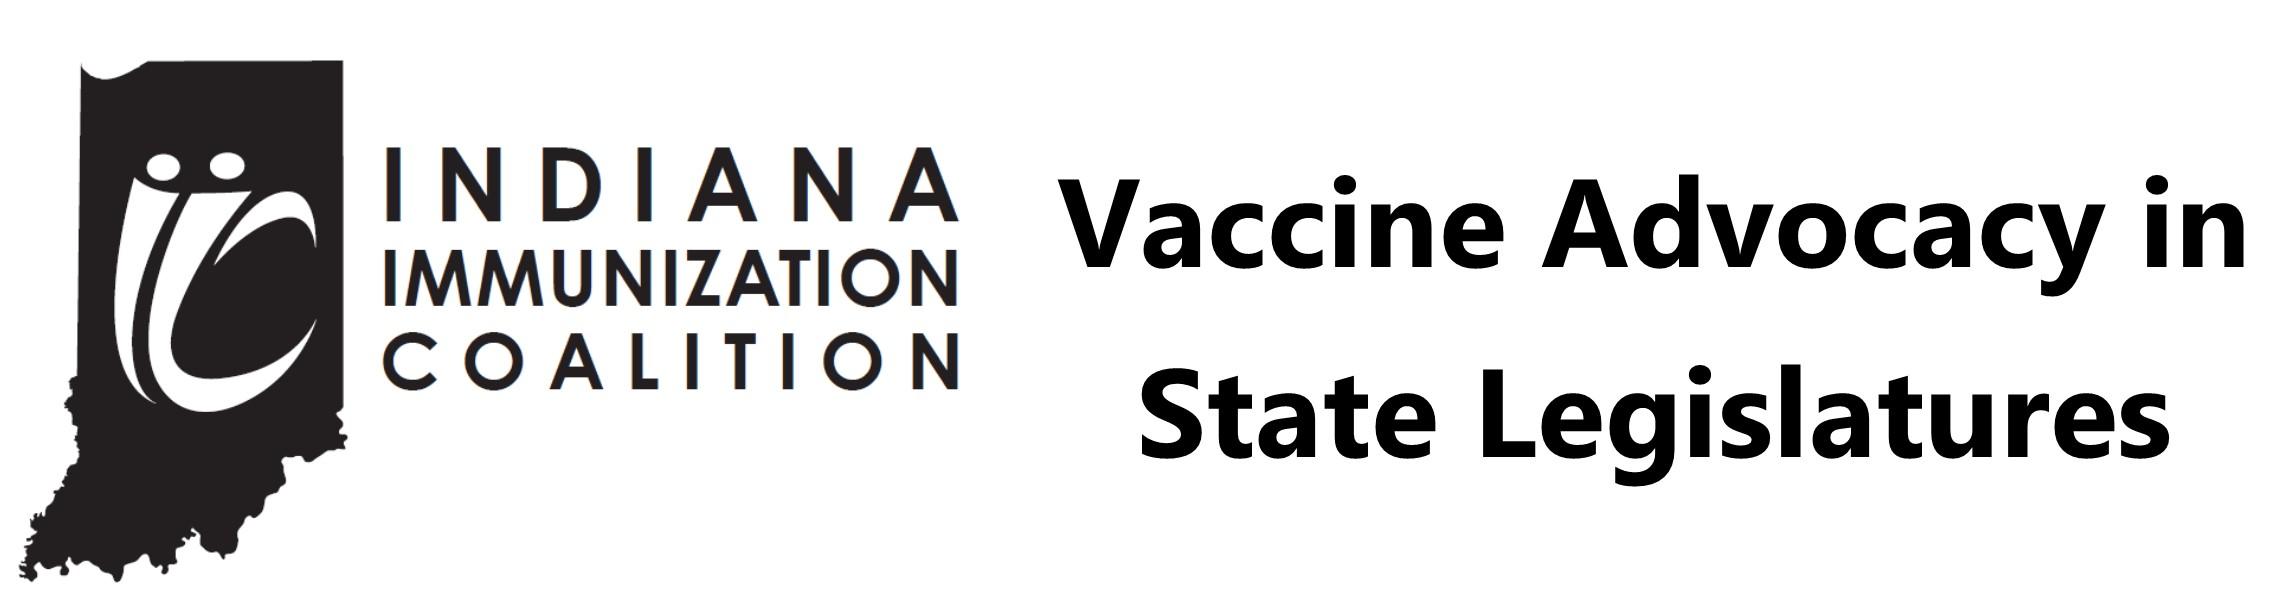 Vaccine Advocacy in State Legislatures Banner